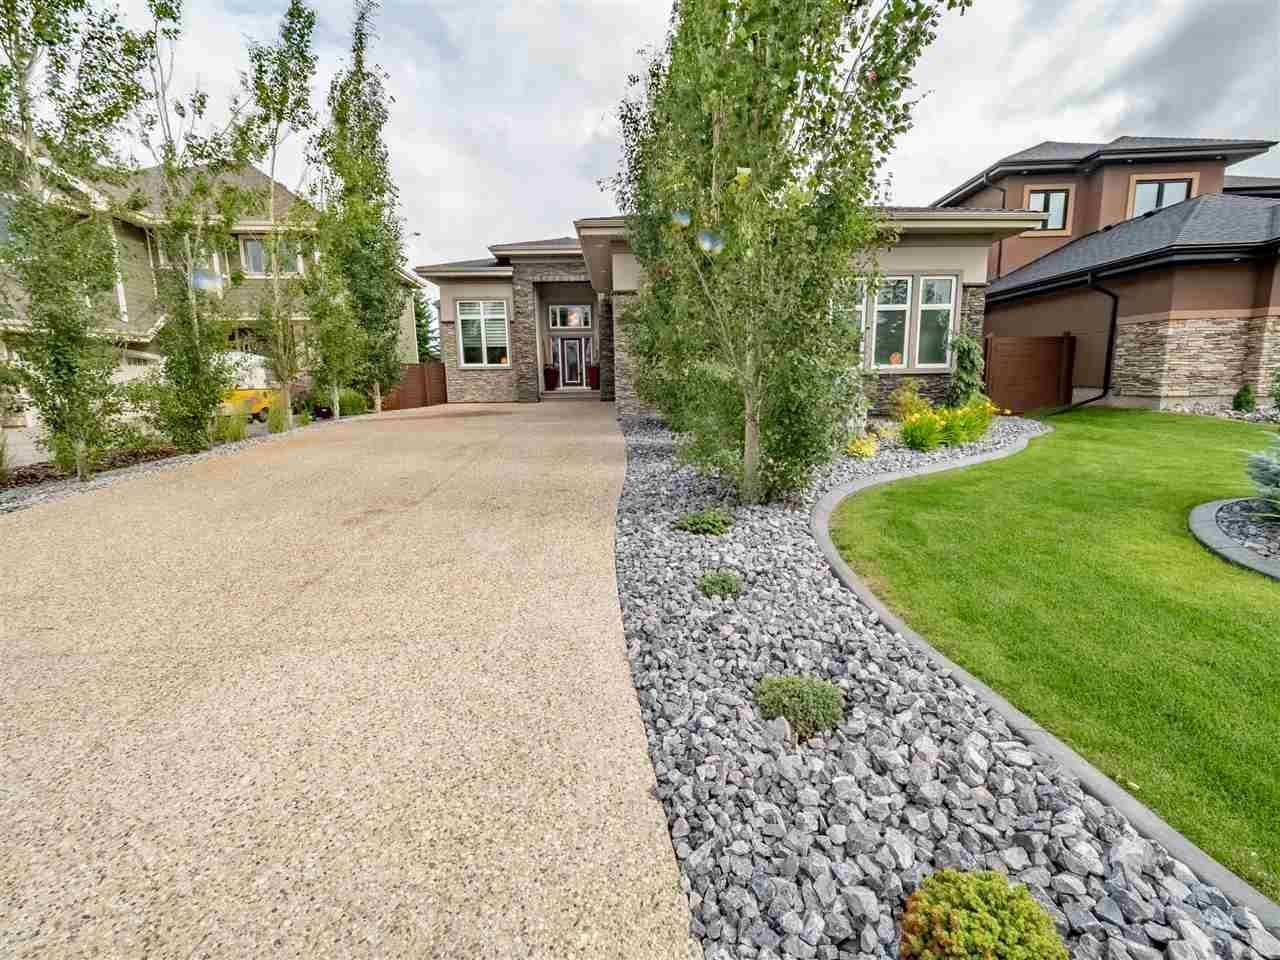 House for sale at 58 Kenton Woods Ln Spruce Grove Alberta - MLS: E4181217